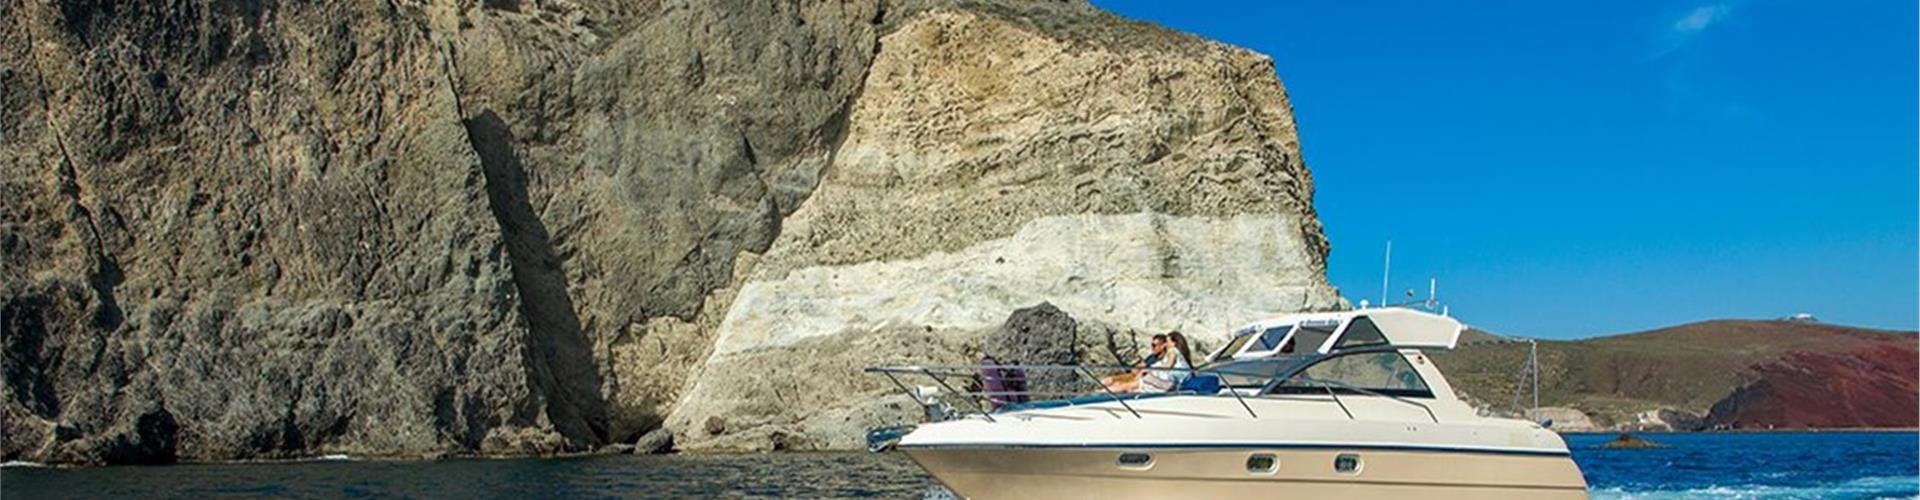 Photo of Motor Yacht Arcoa 33 Pelagos